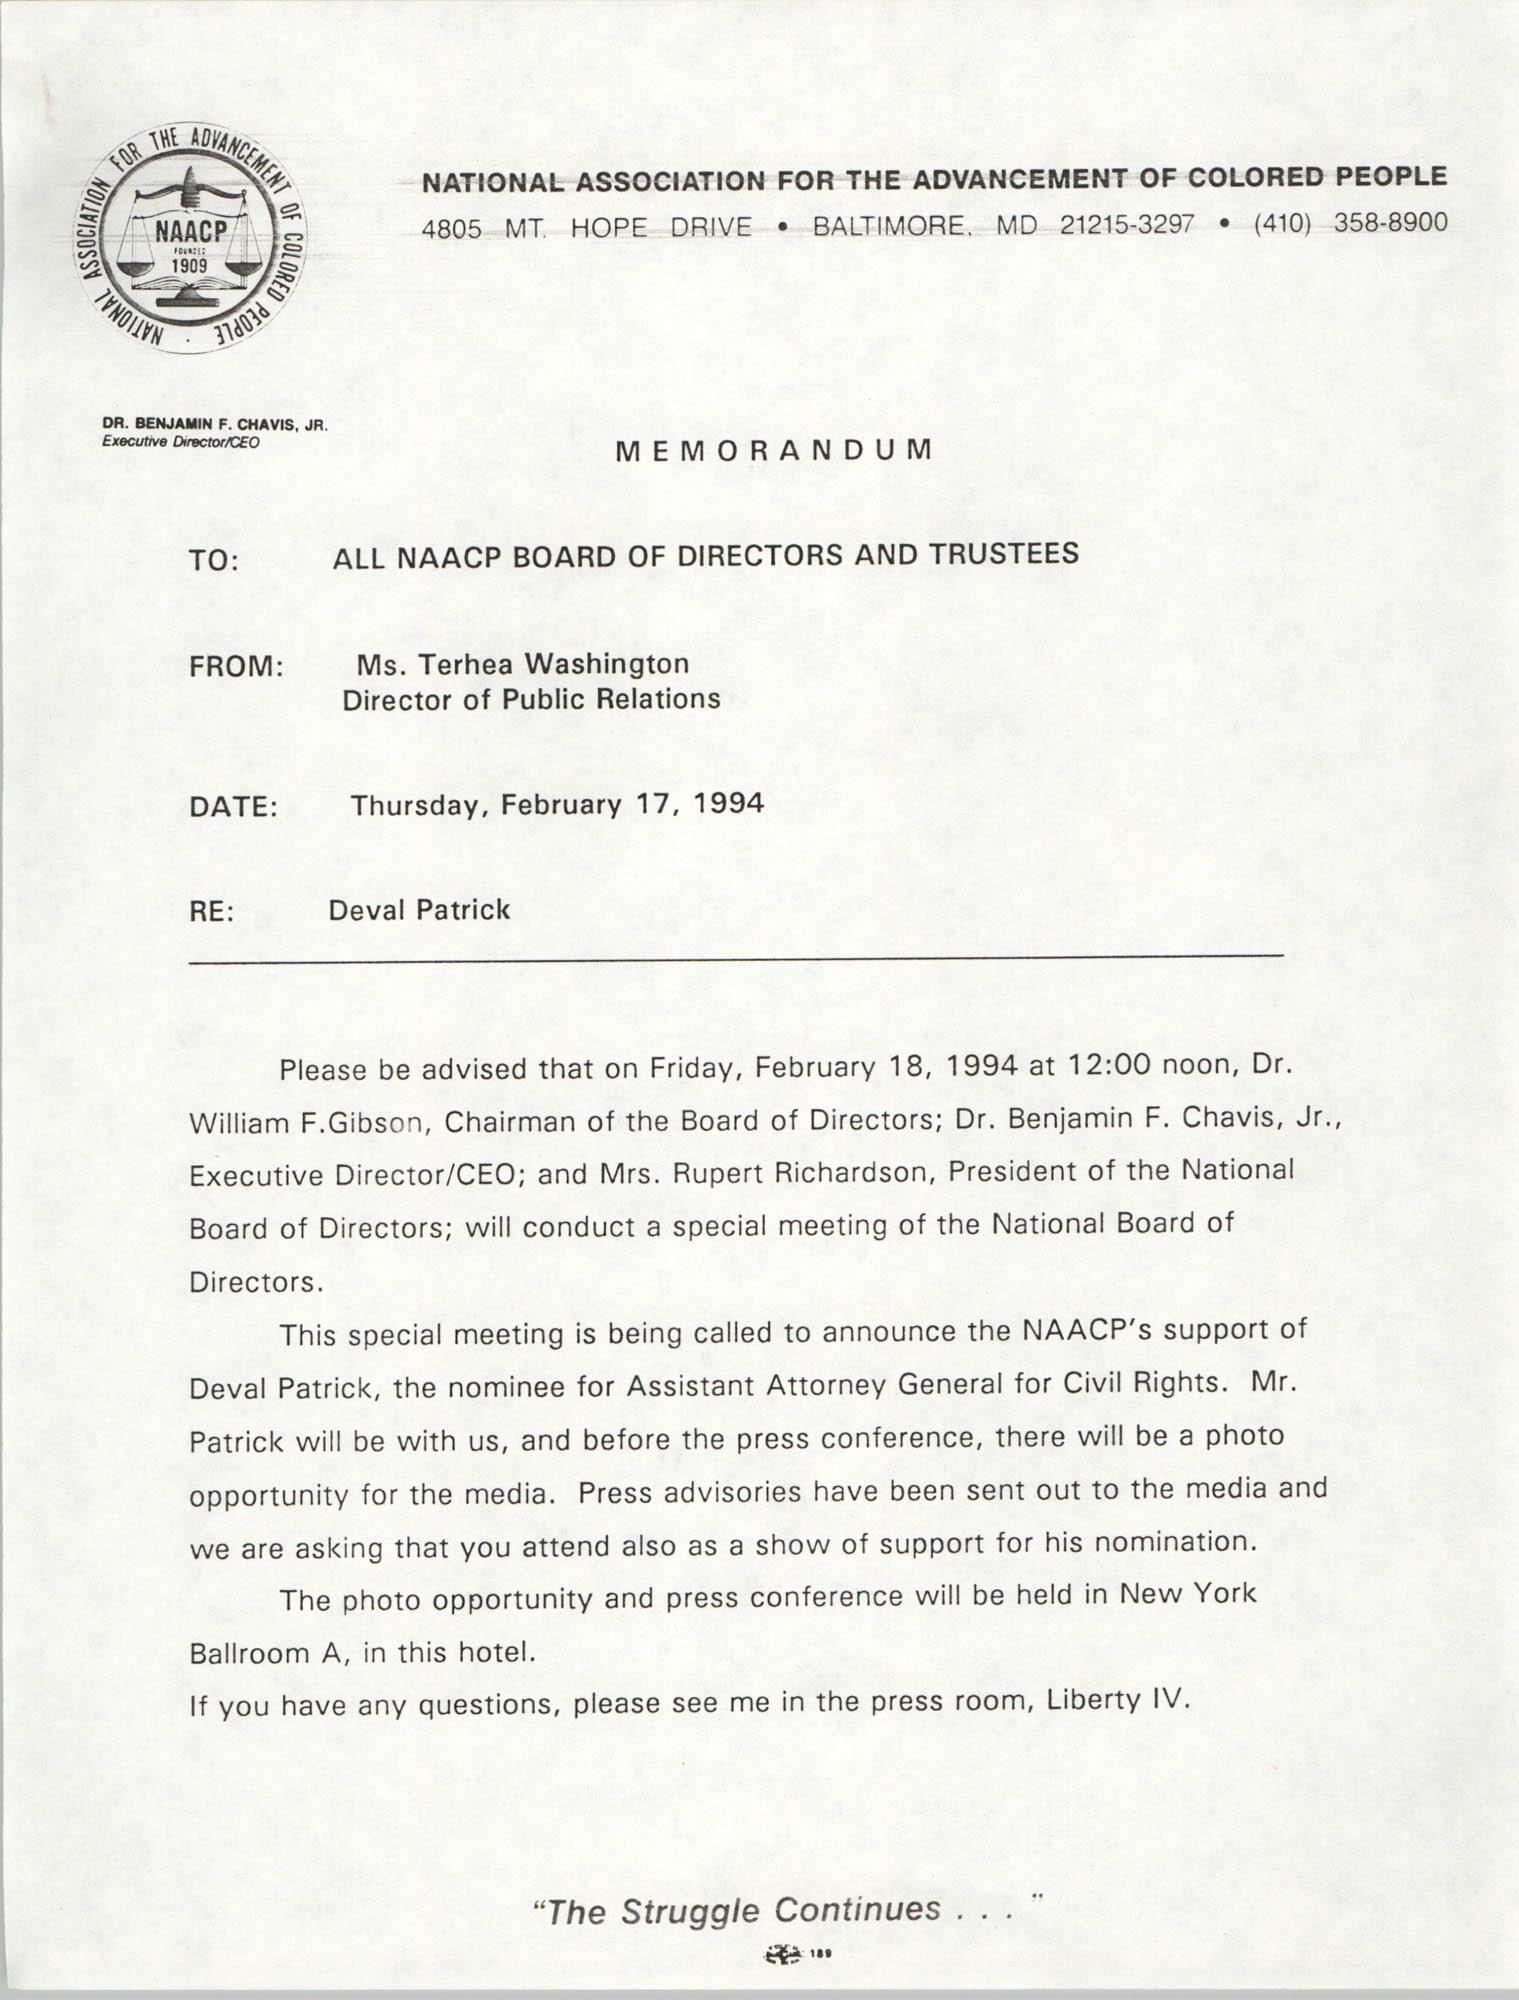 NAACP Memorandum, February 17, 1994